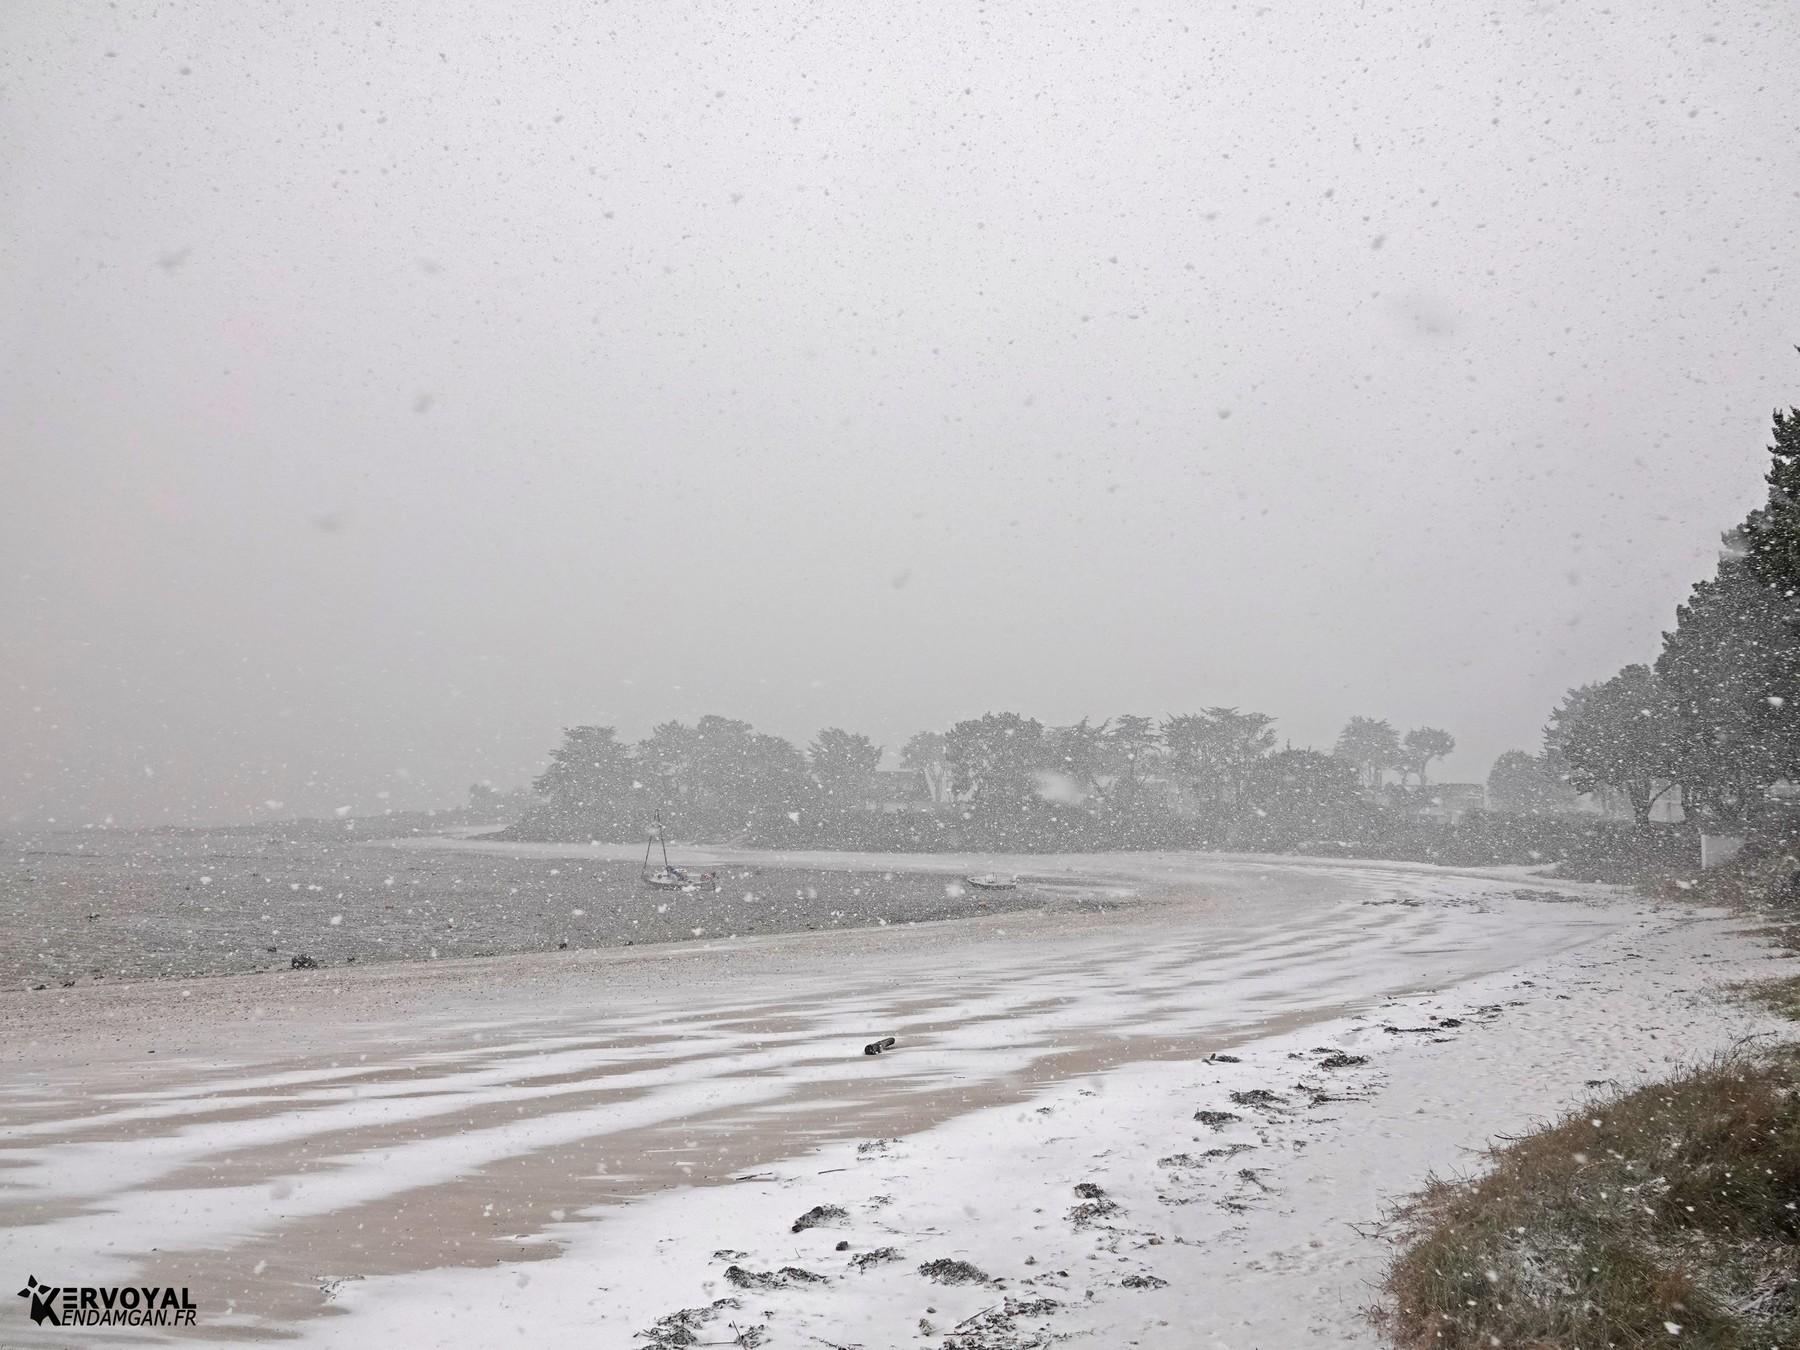 neige à kervoyal 11 février 2021 damgan morbihan (20)